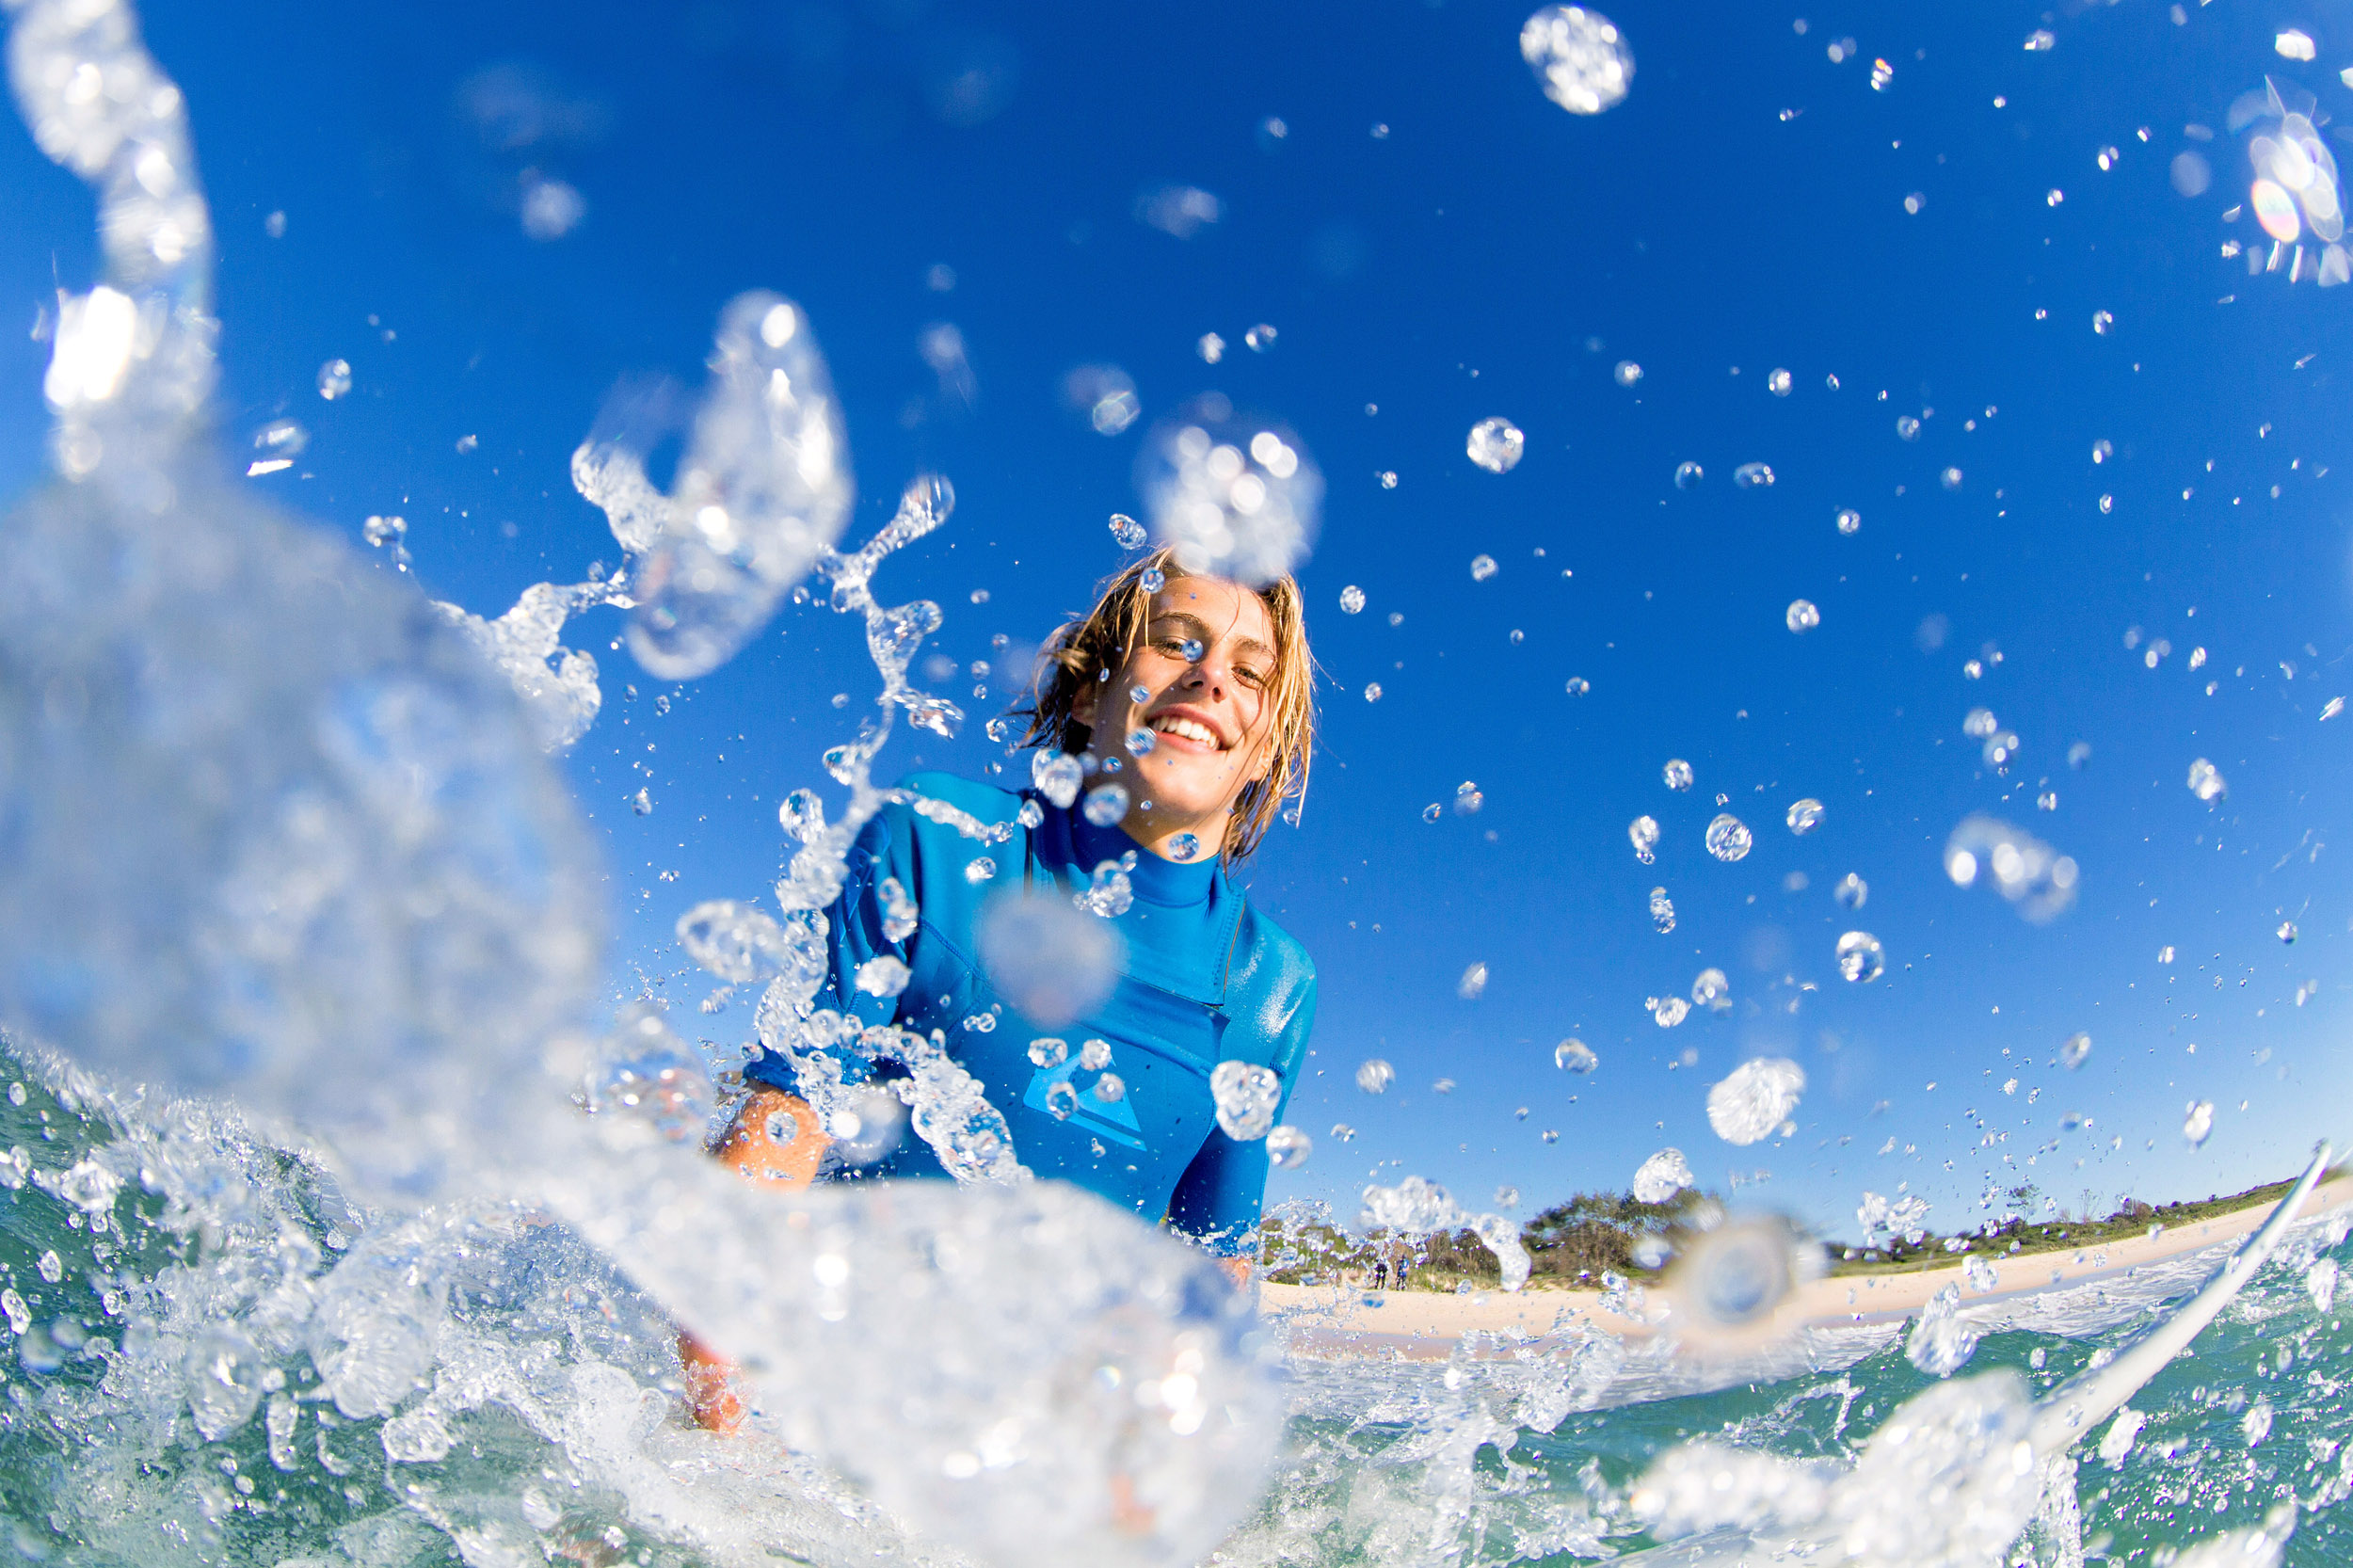 surf-photography-HPC-27.jpg